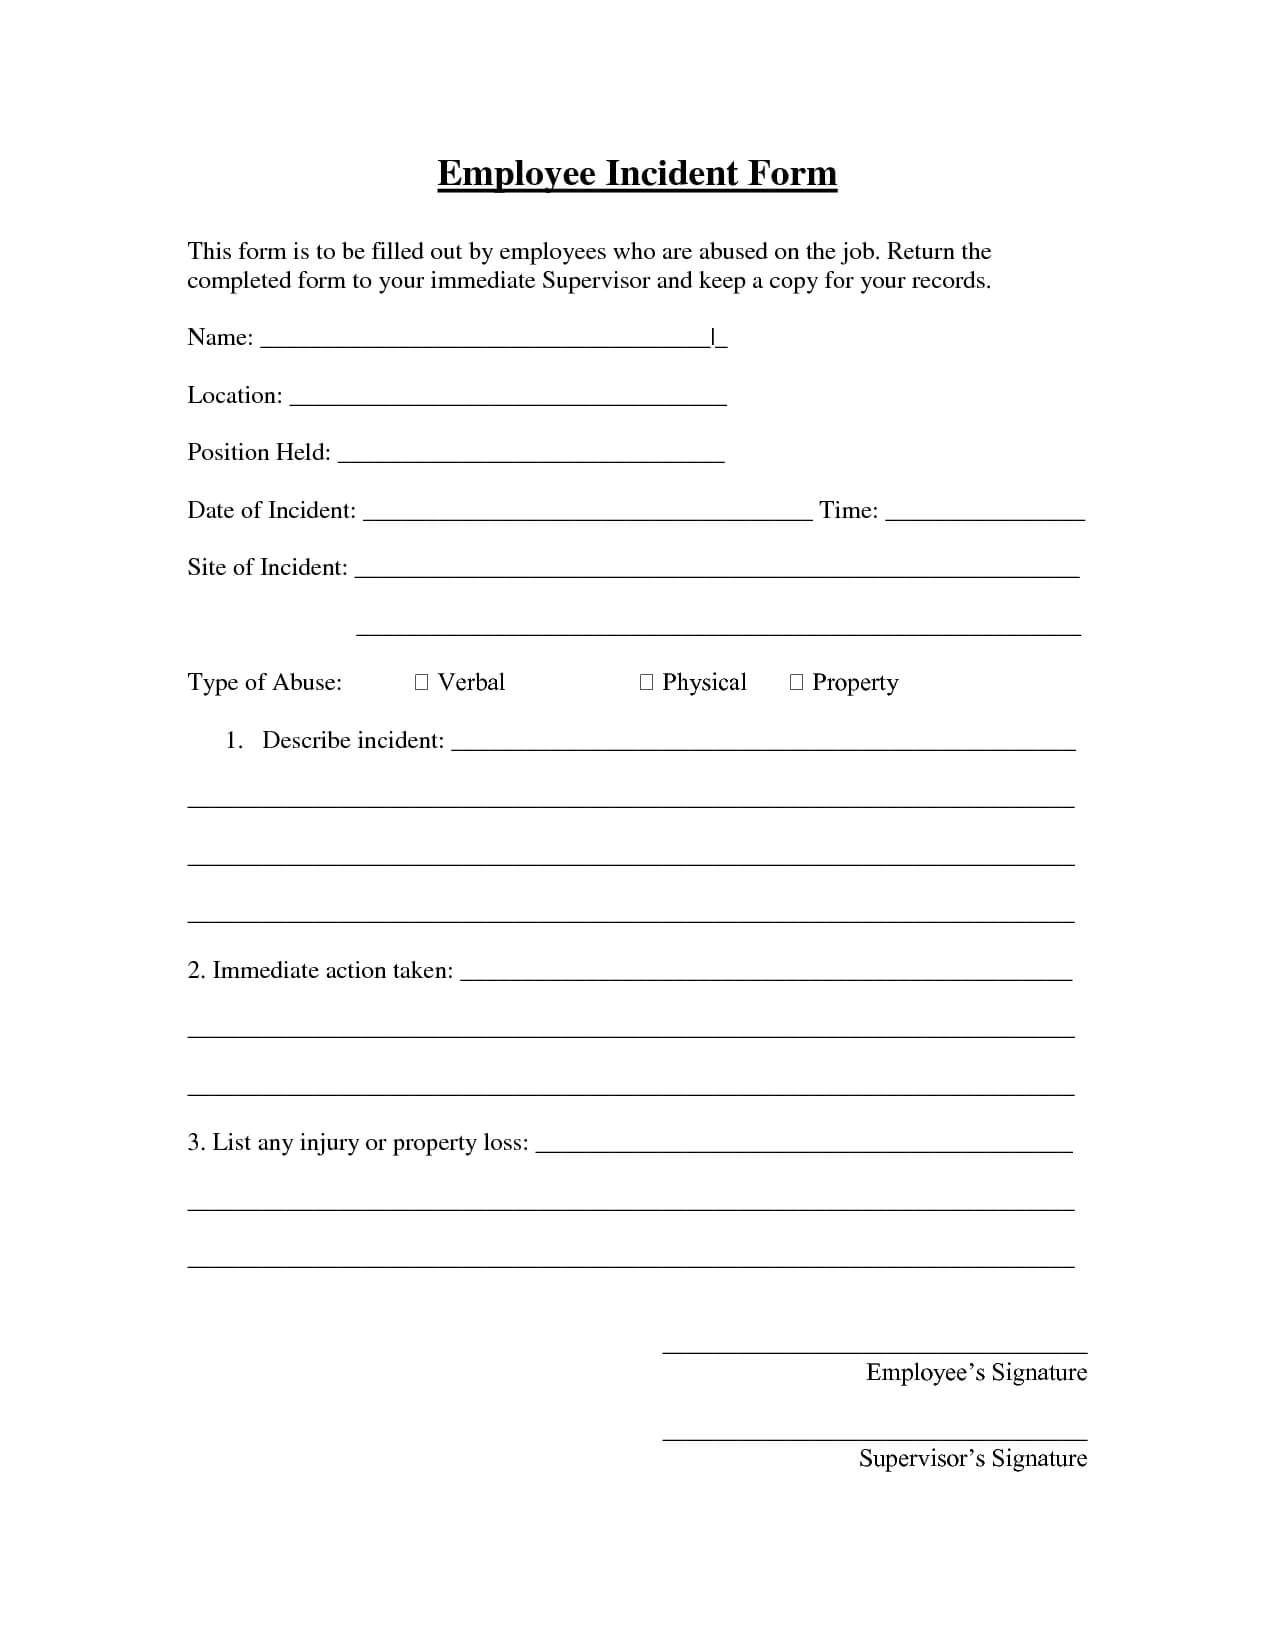 005 Employee Incident Report Form Template 290707 Top Ideas With Employee Incident Report Templates